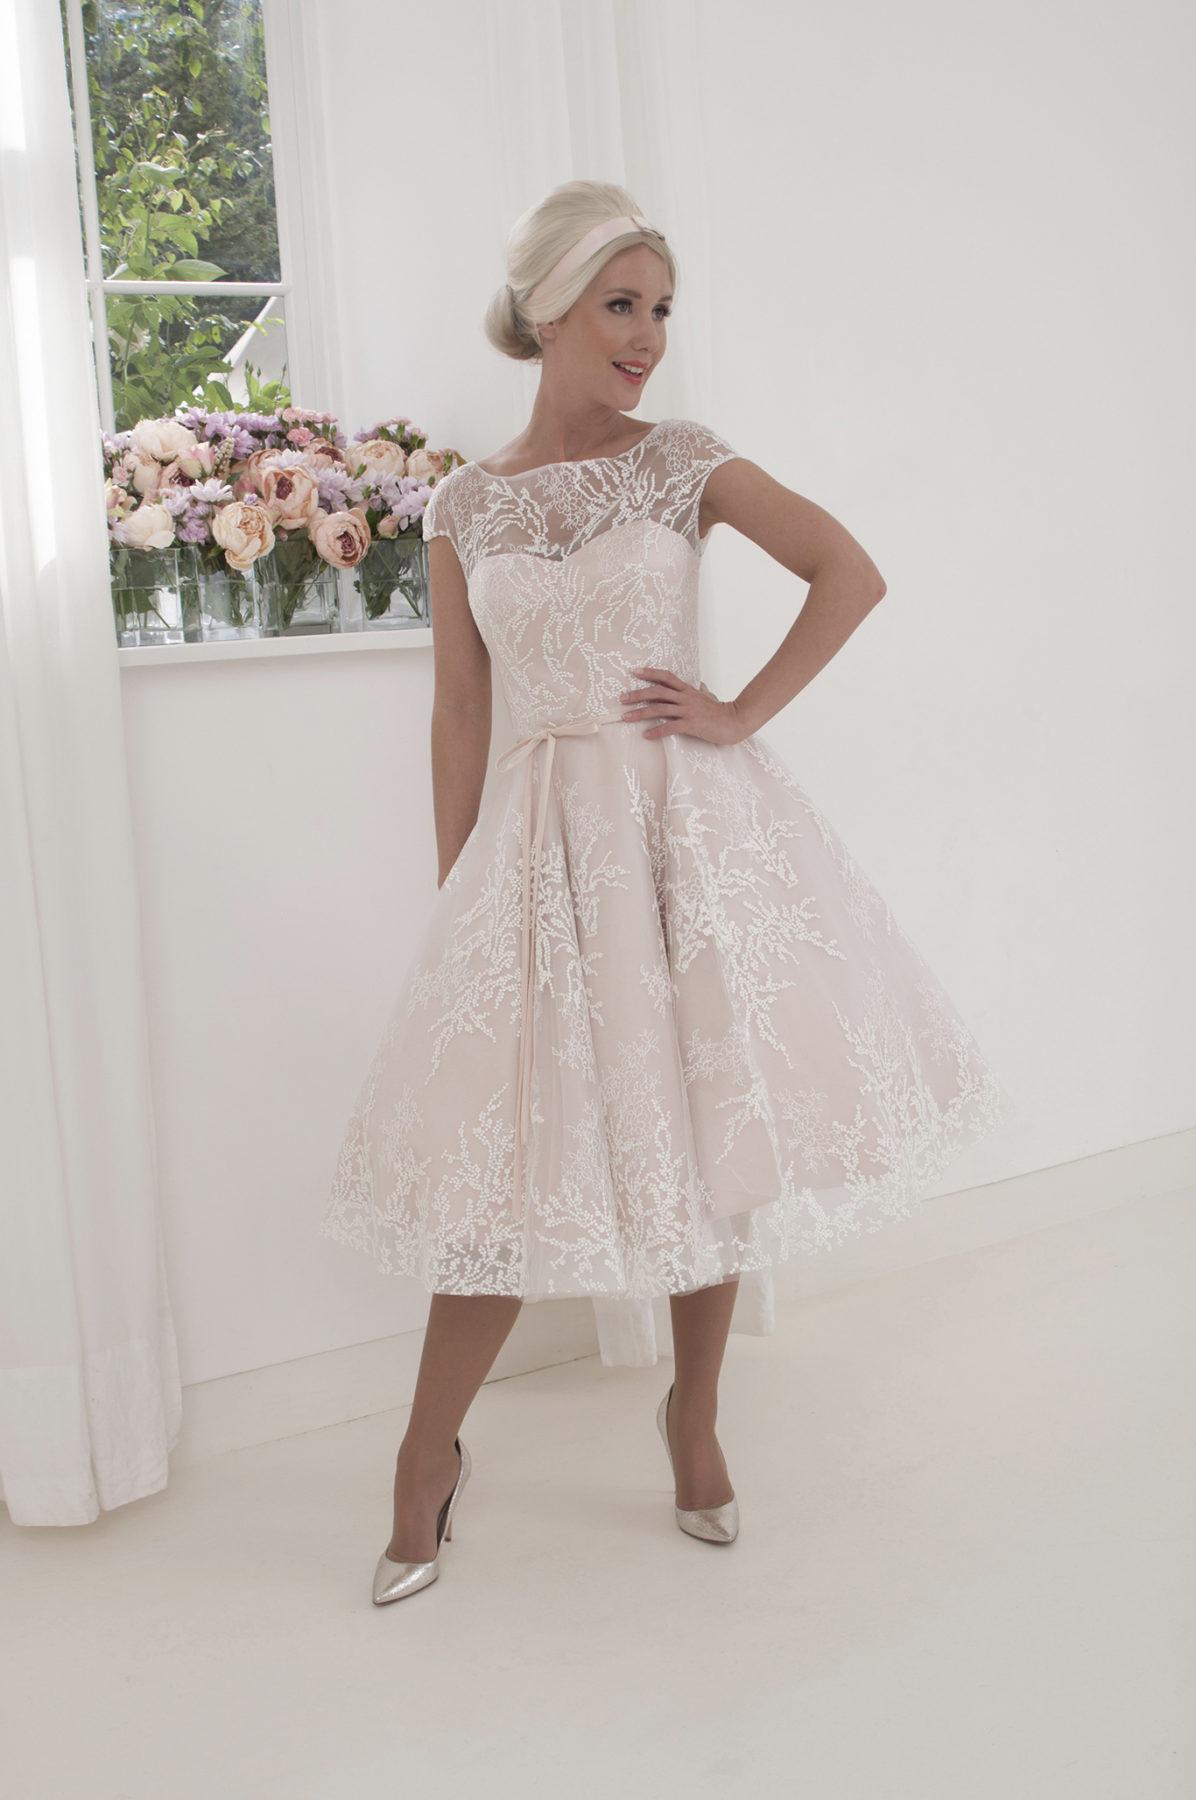 Enid mooshki dress